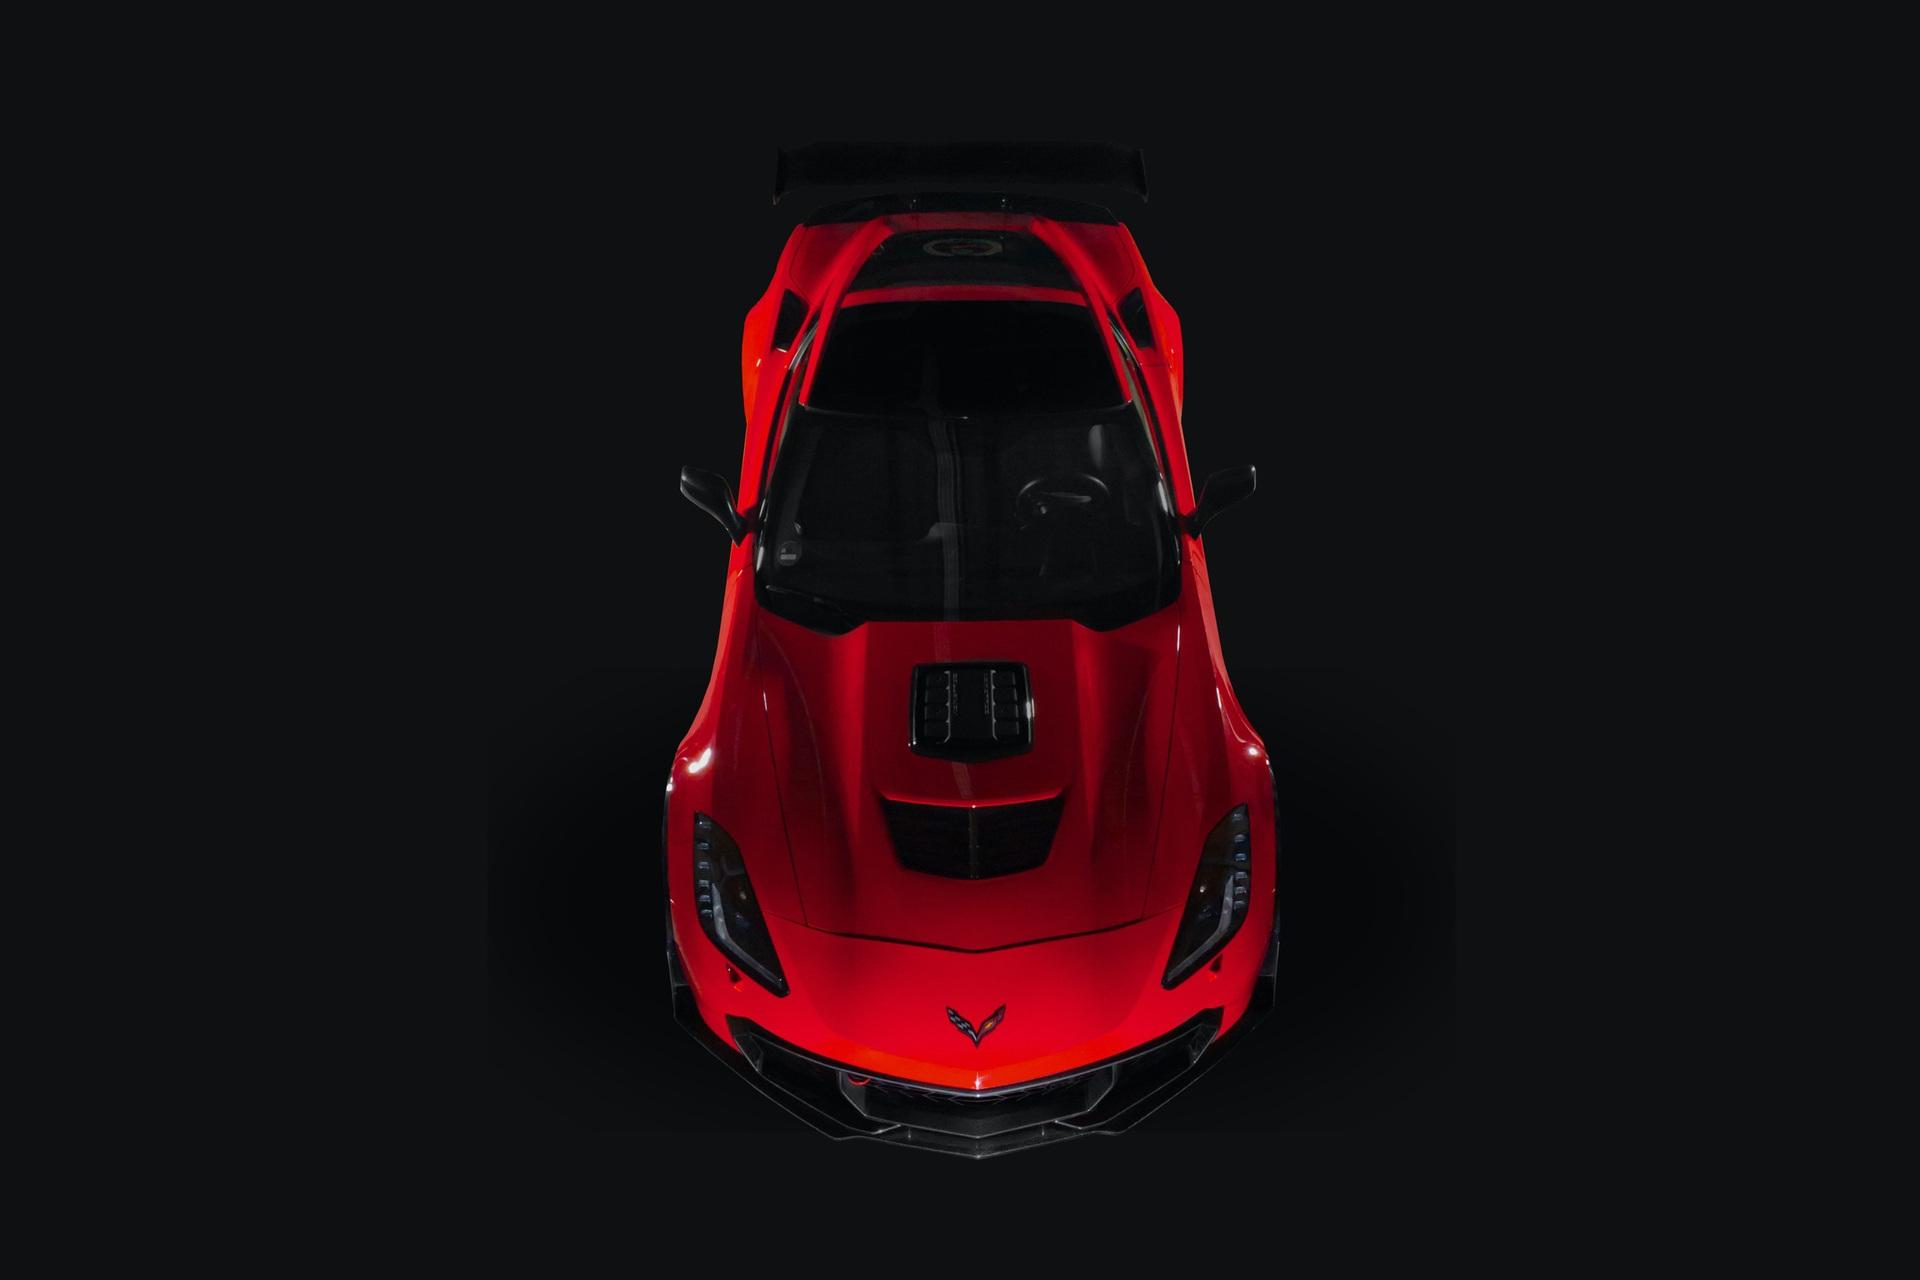 Callaway_C7_Corvette_limited_edition_0001